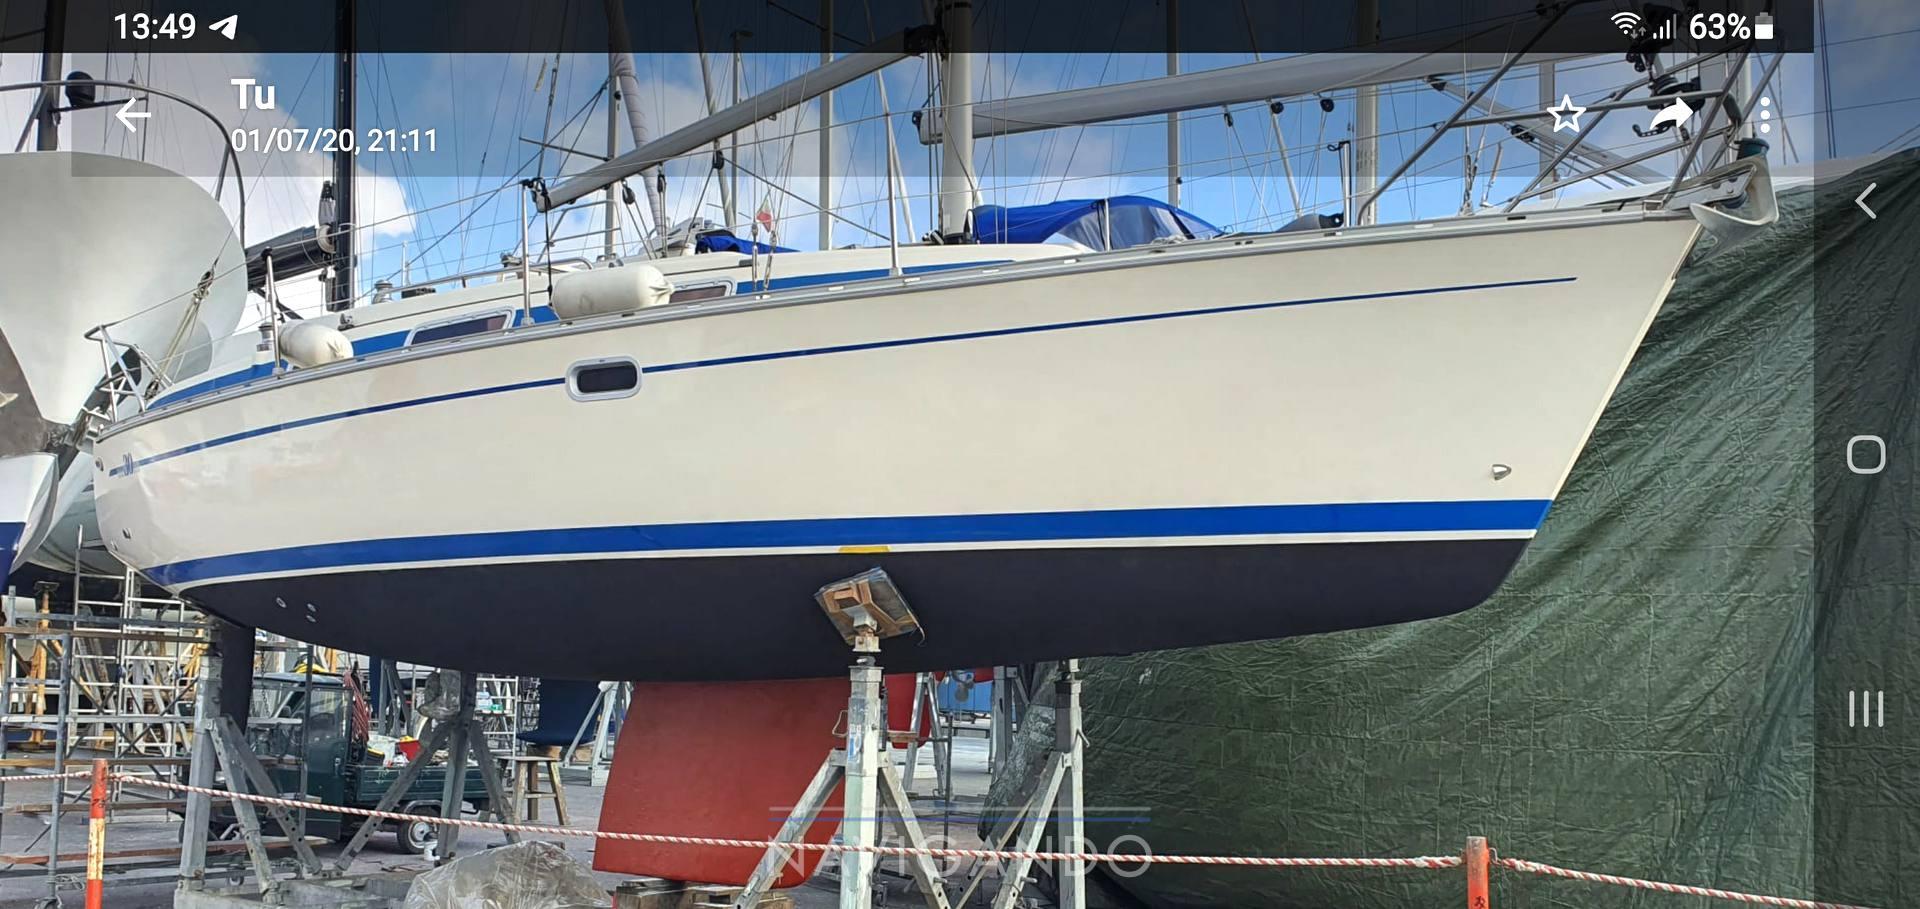 Bavaria 30 plus Barca a vela usata in vendita